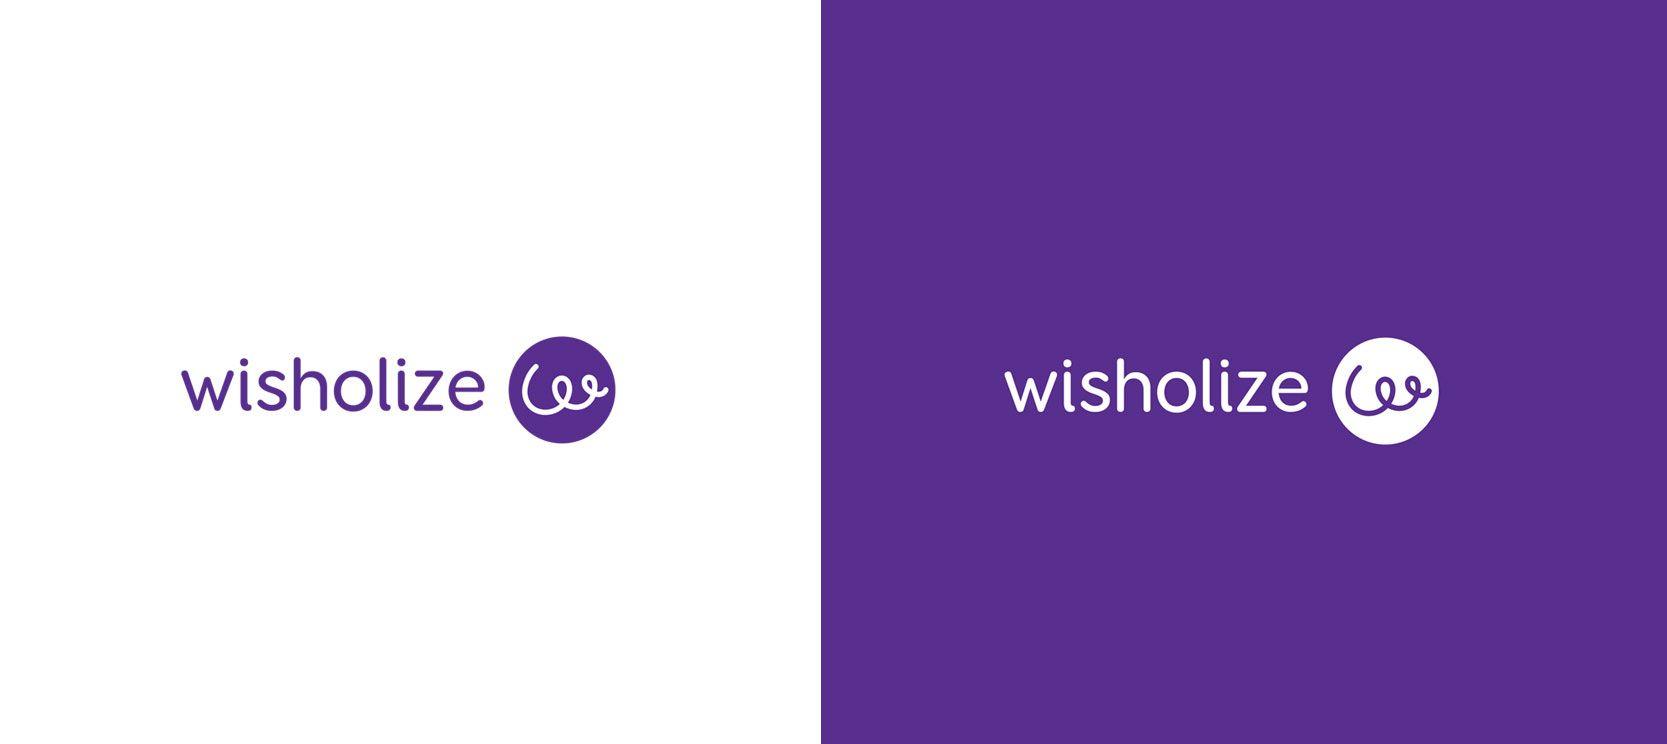 #Gift #Brand #Branding #Identity #Logo #Launch #Designs #Wisholize #Gifting #Personalized www.wisholize.com